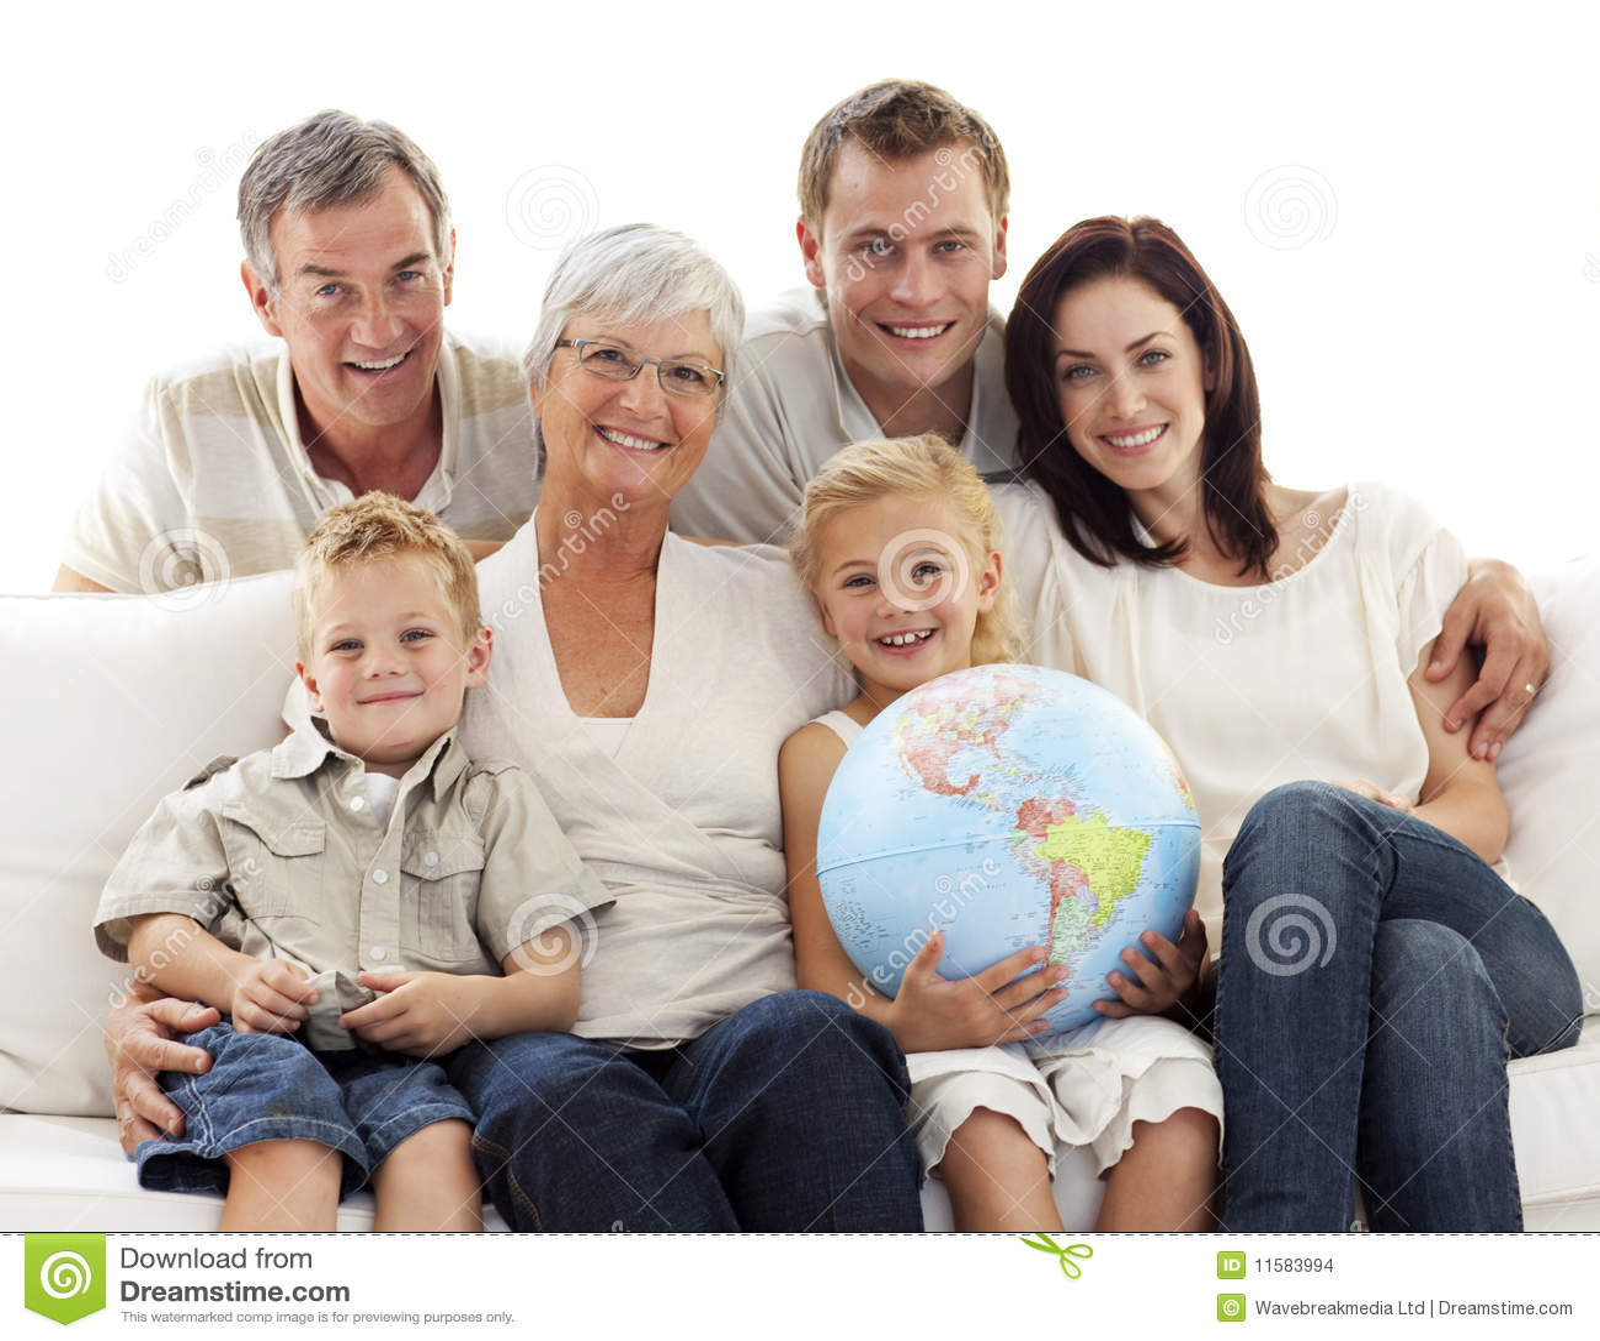 Big family on sofa holding a terrestrial globe